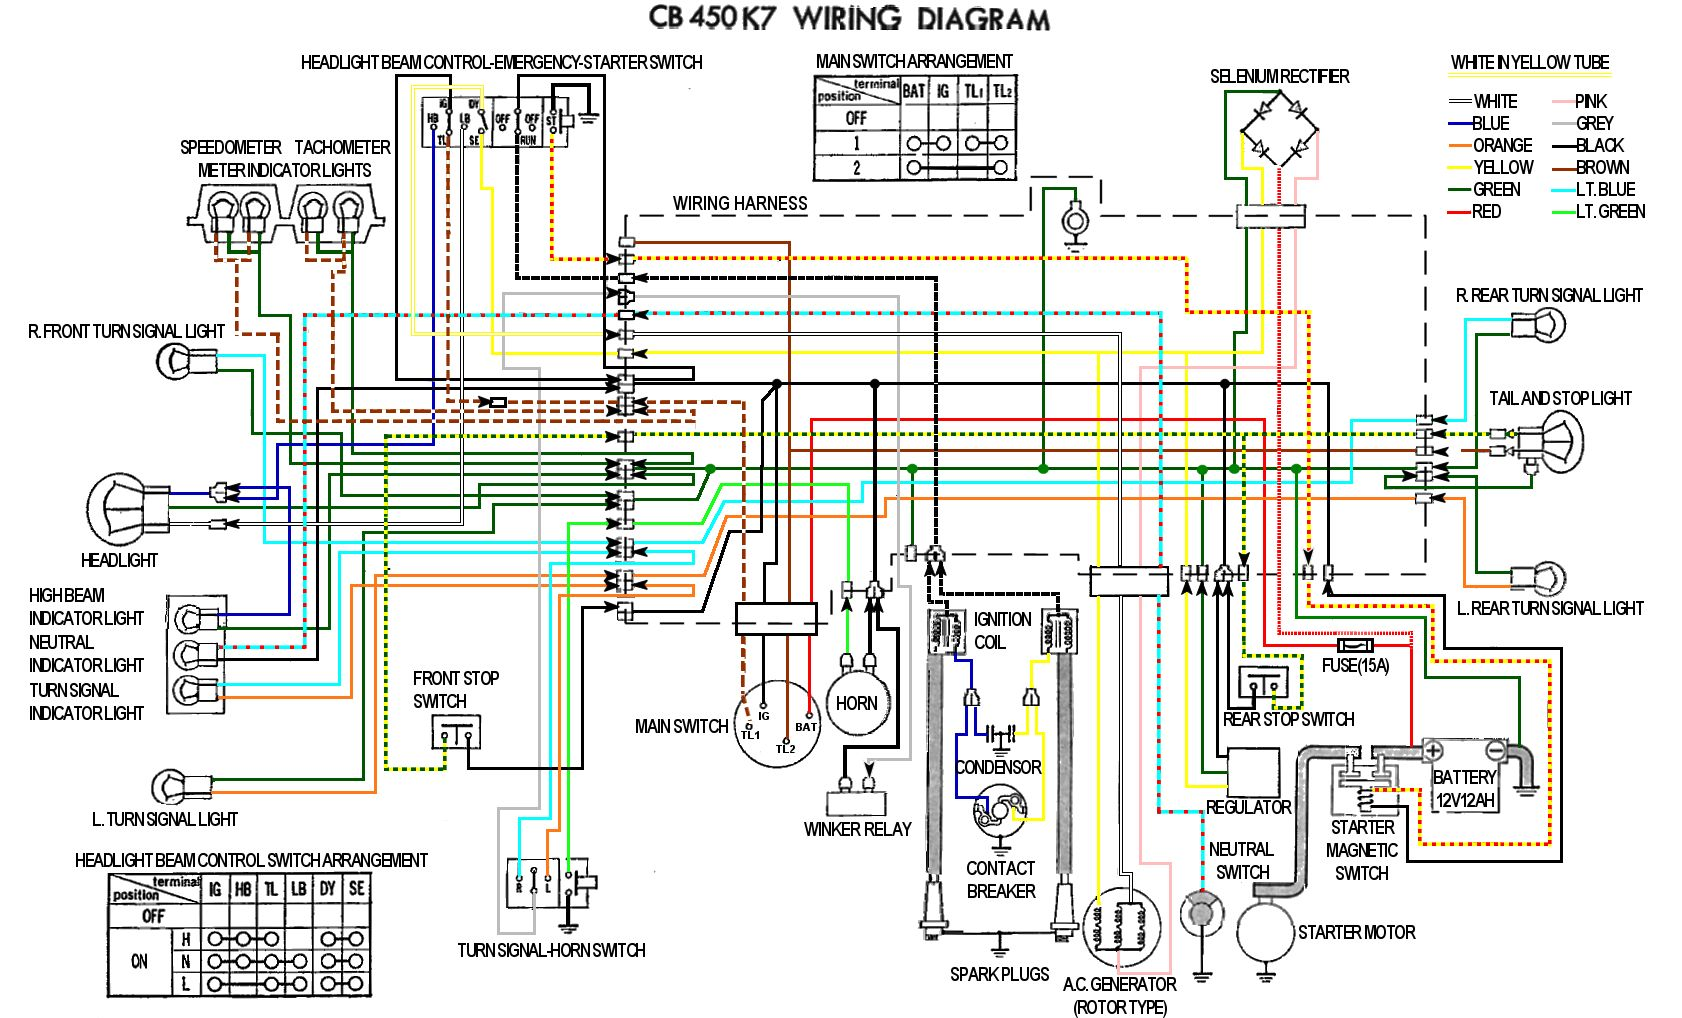 cbr500r wiring diagram auto wiring diagram today u2022 rh bigrecharge co Basic Electrical Wiring Diagrams 2014 honda cbr500r wiring diagram